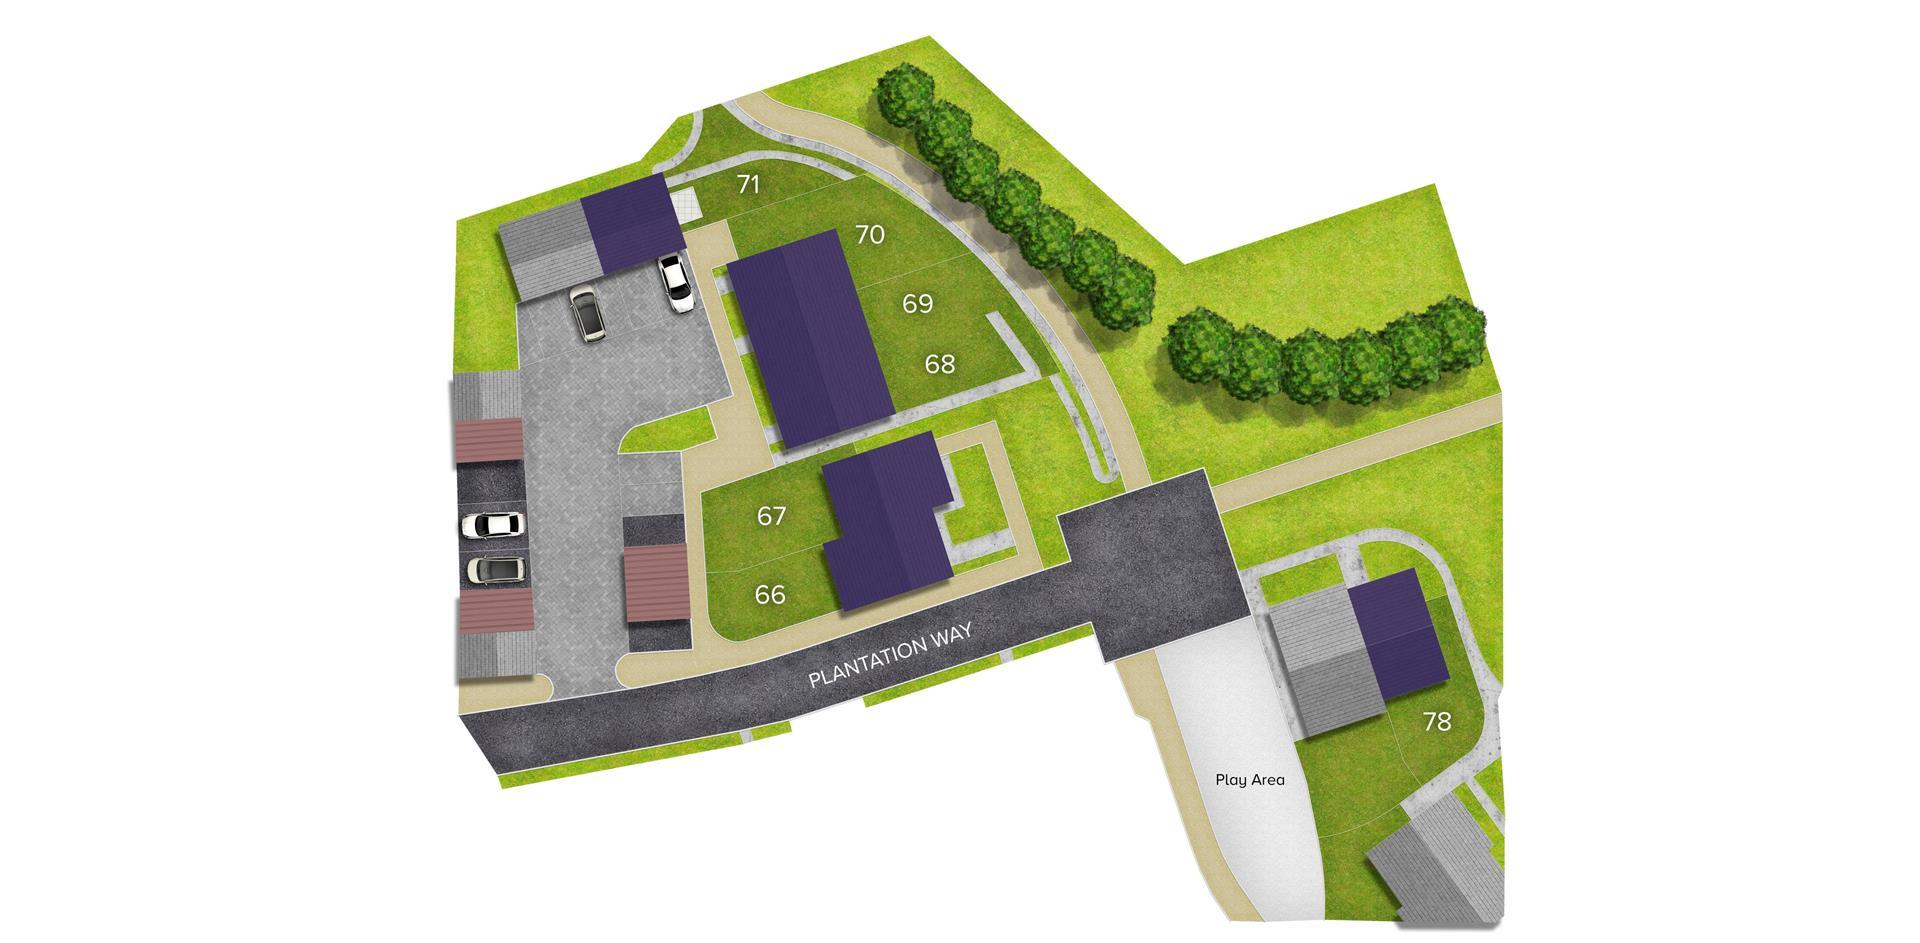 Plot 66 - 71 & 78 site plan.jpg